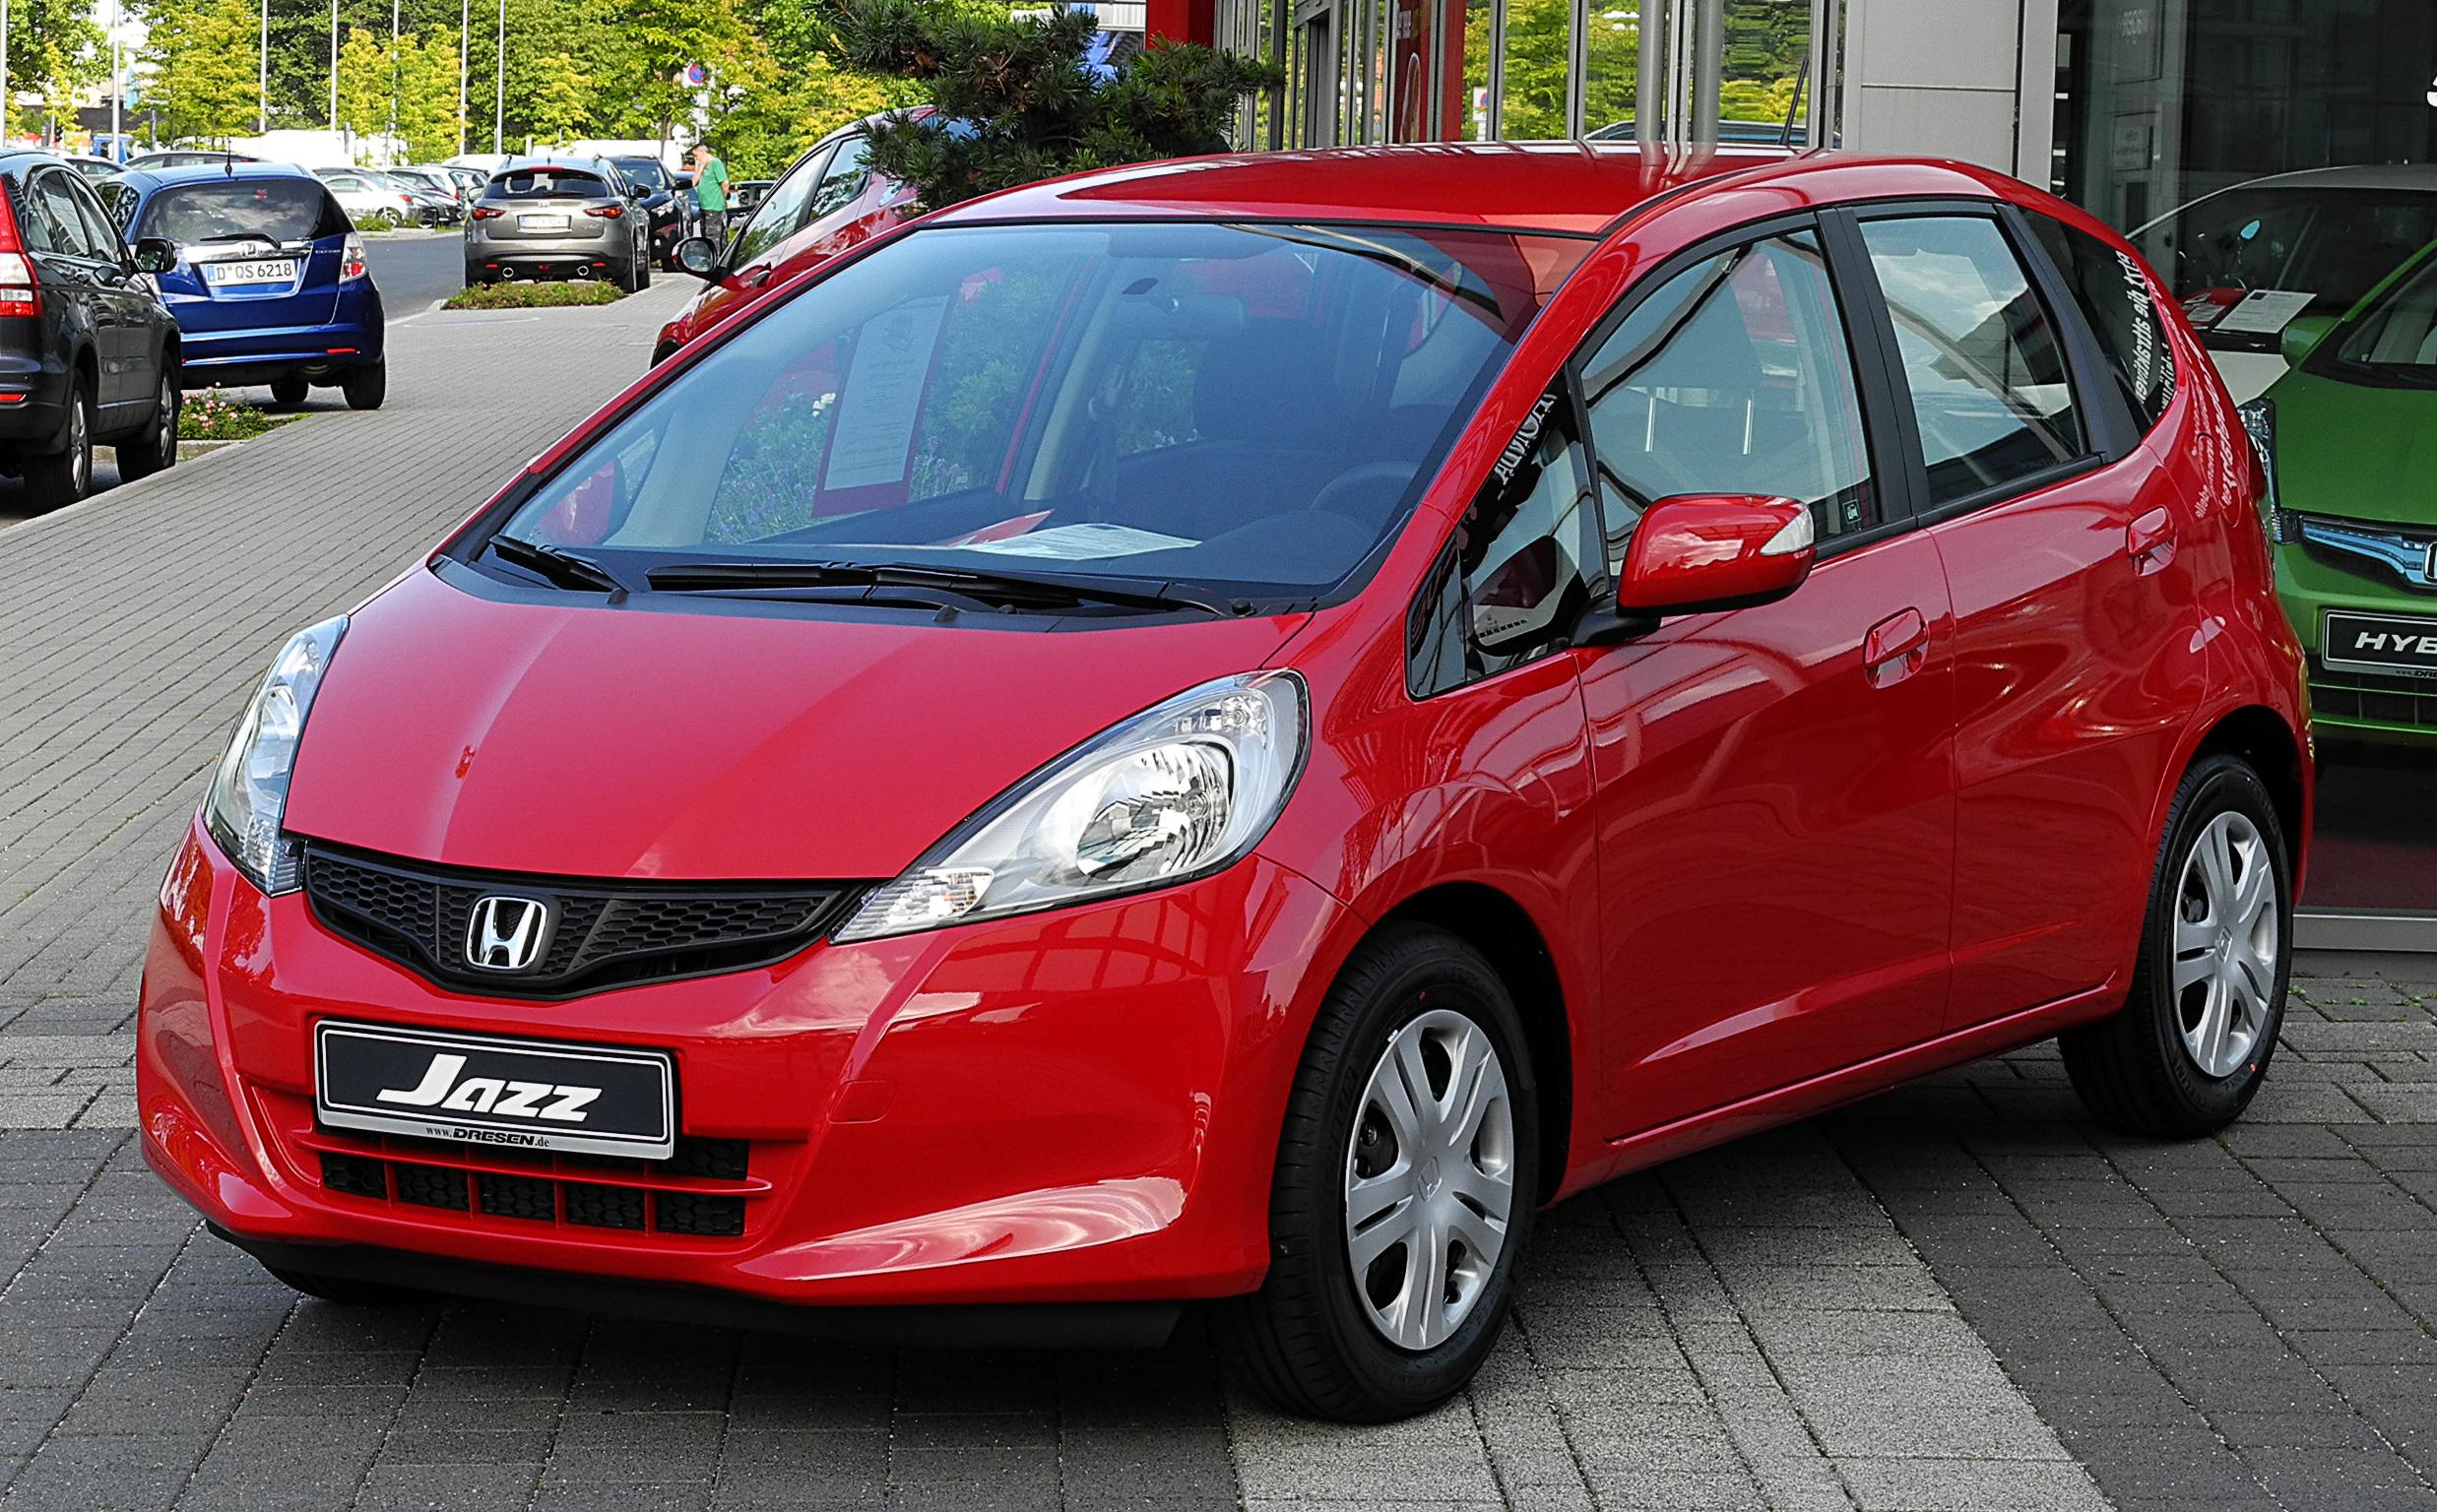 File:Honda Jazz 1.4 i-VTEC Trend (III, Facelift) – Frontansicht, 26